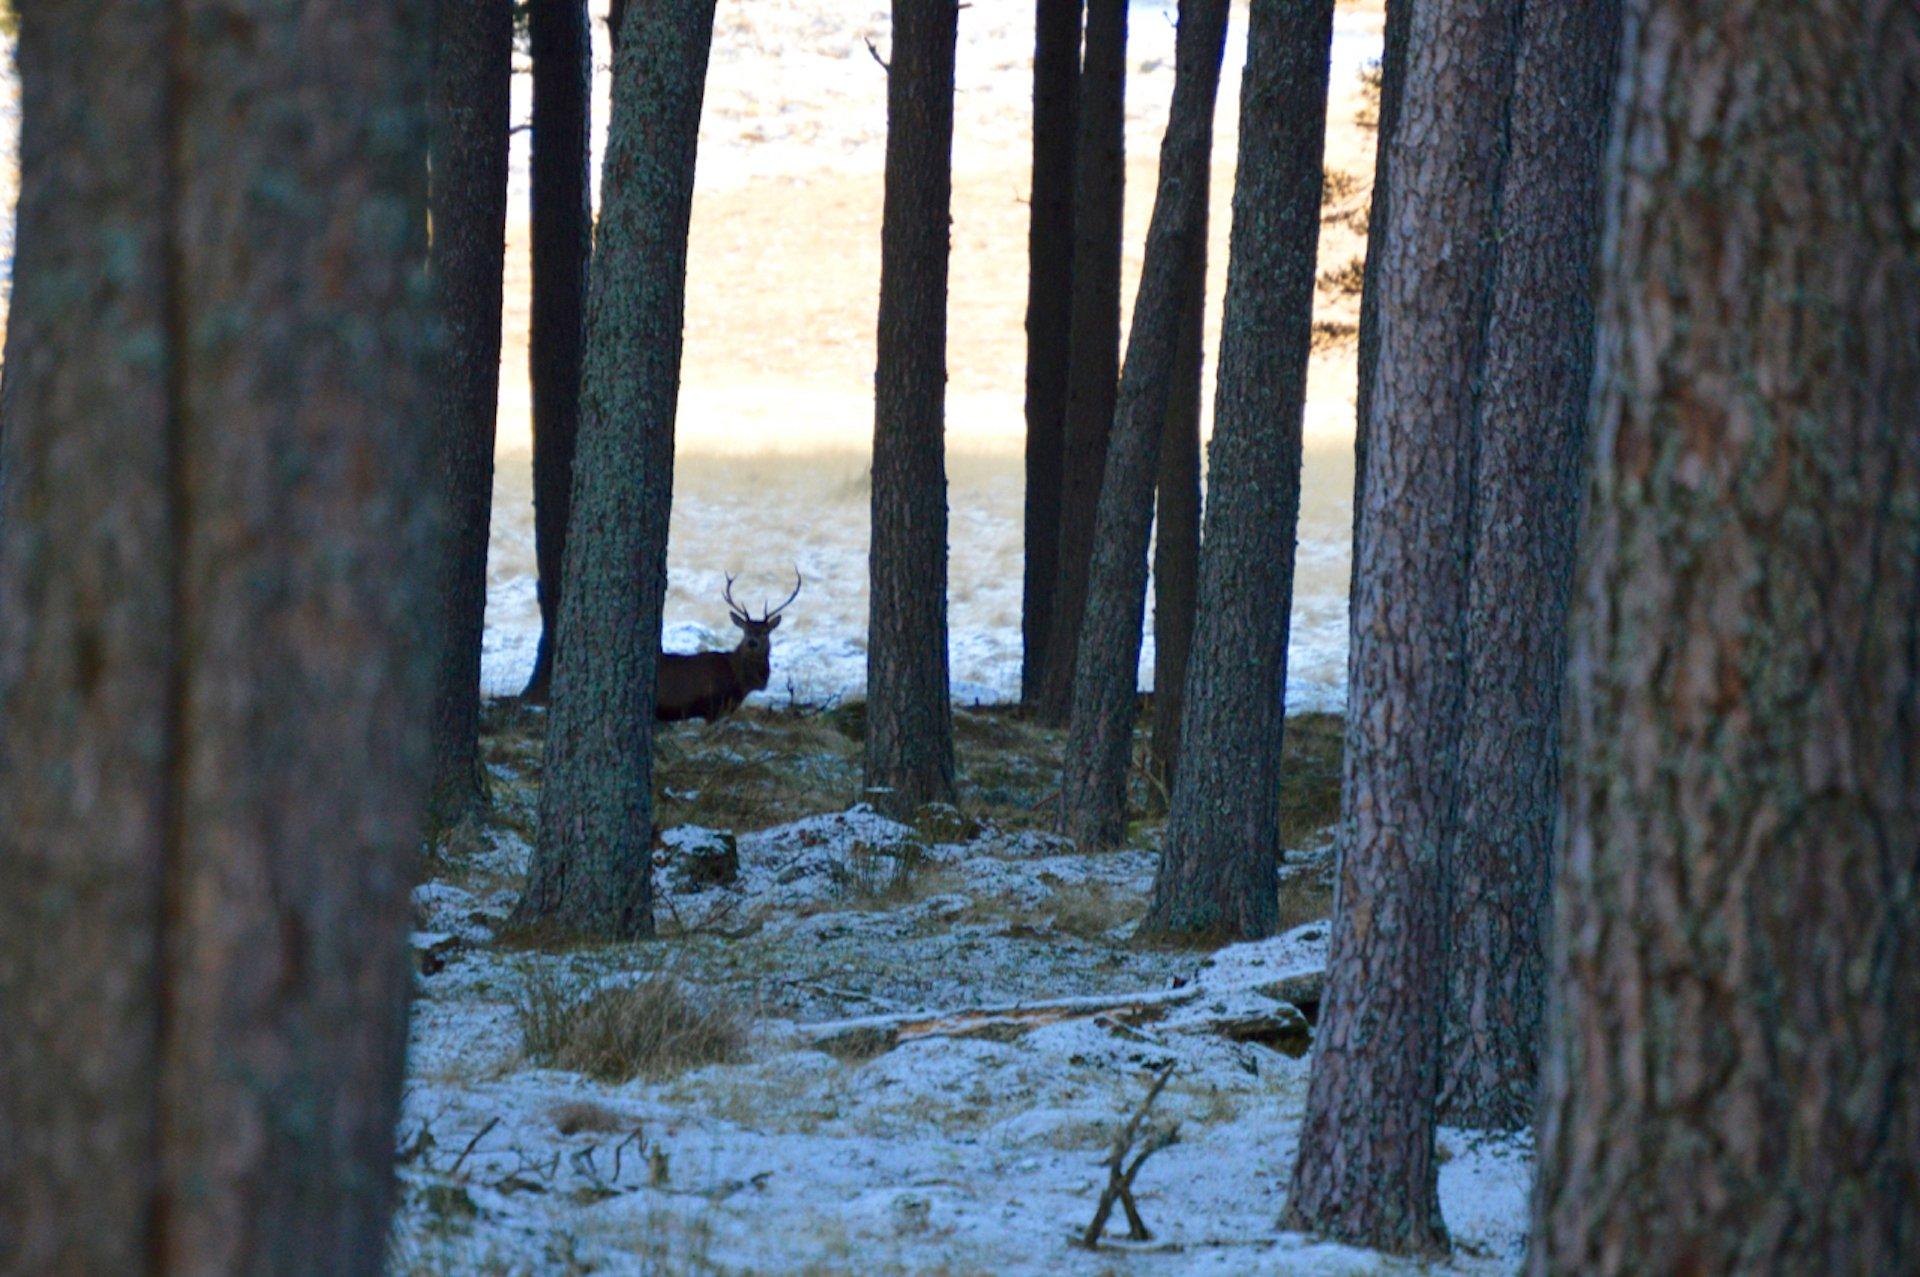 EDNUGGET wildlife winter deer vacation great britain stag scotland highlands balmoral t20 YX9P7R